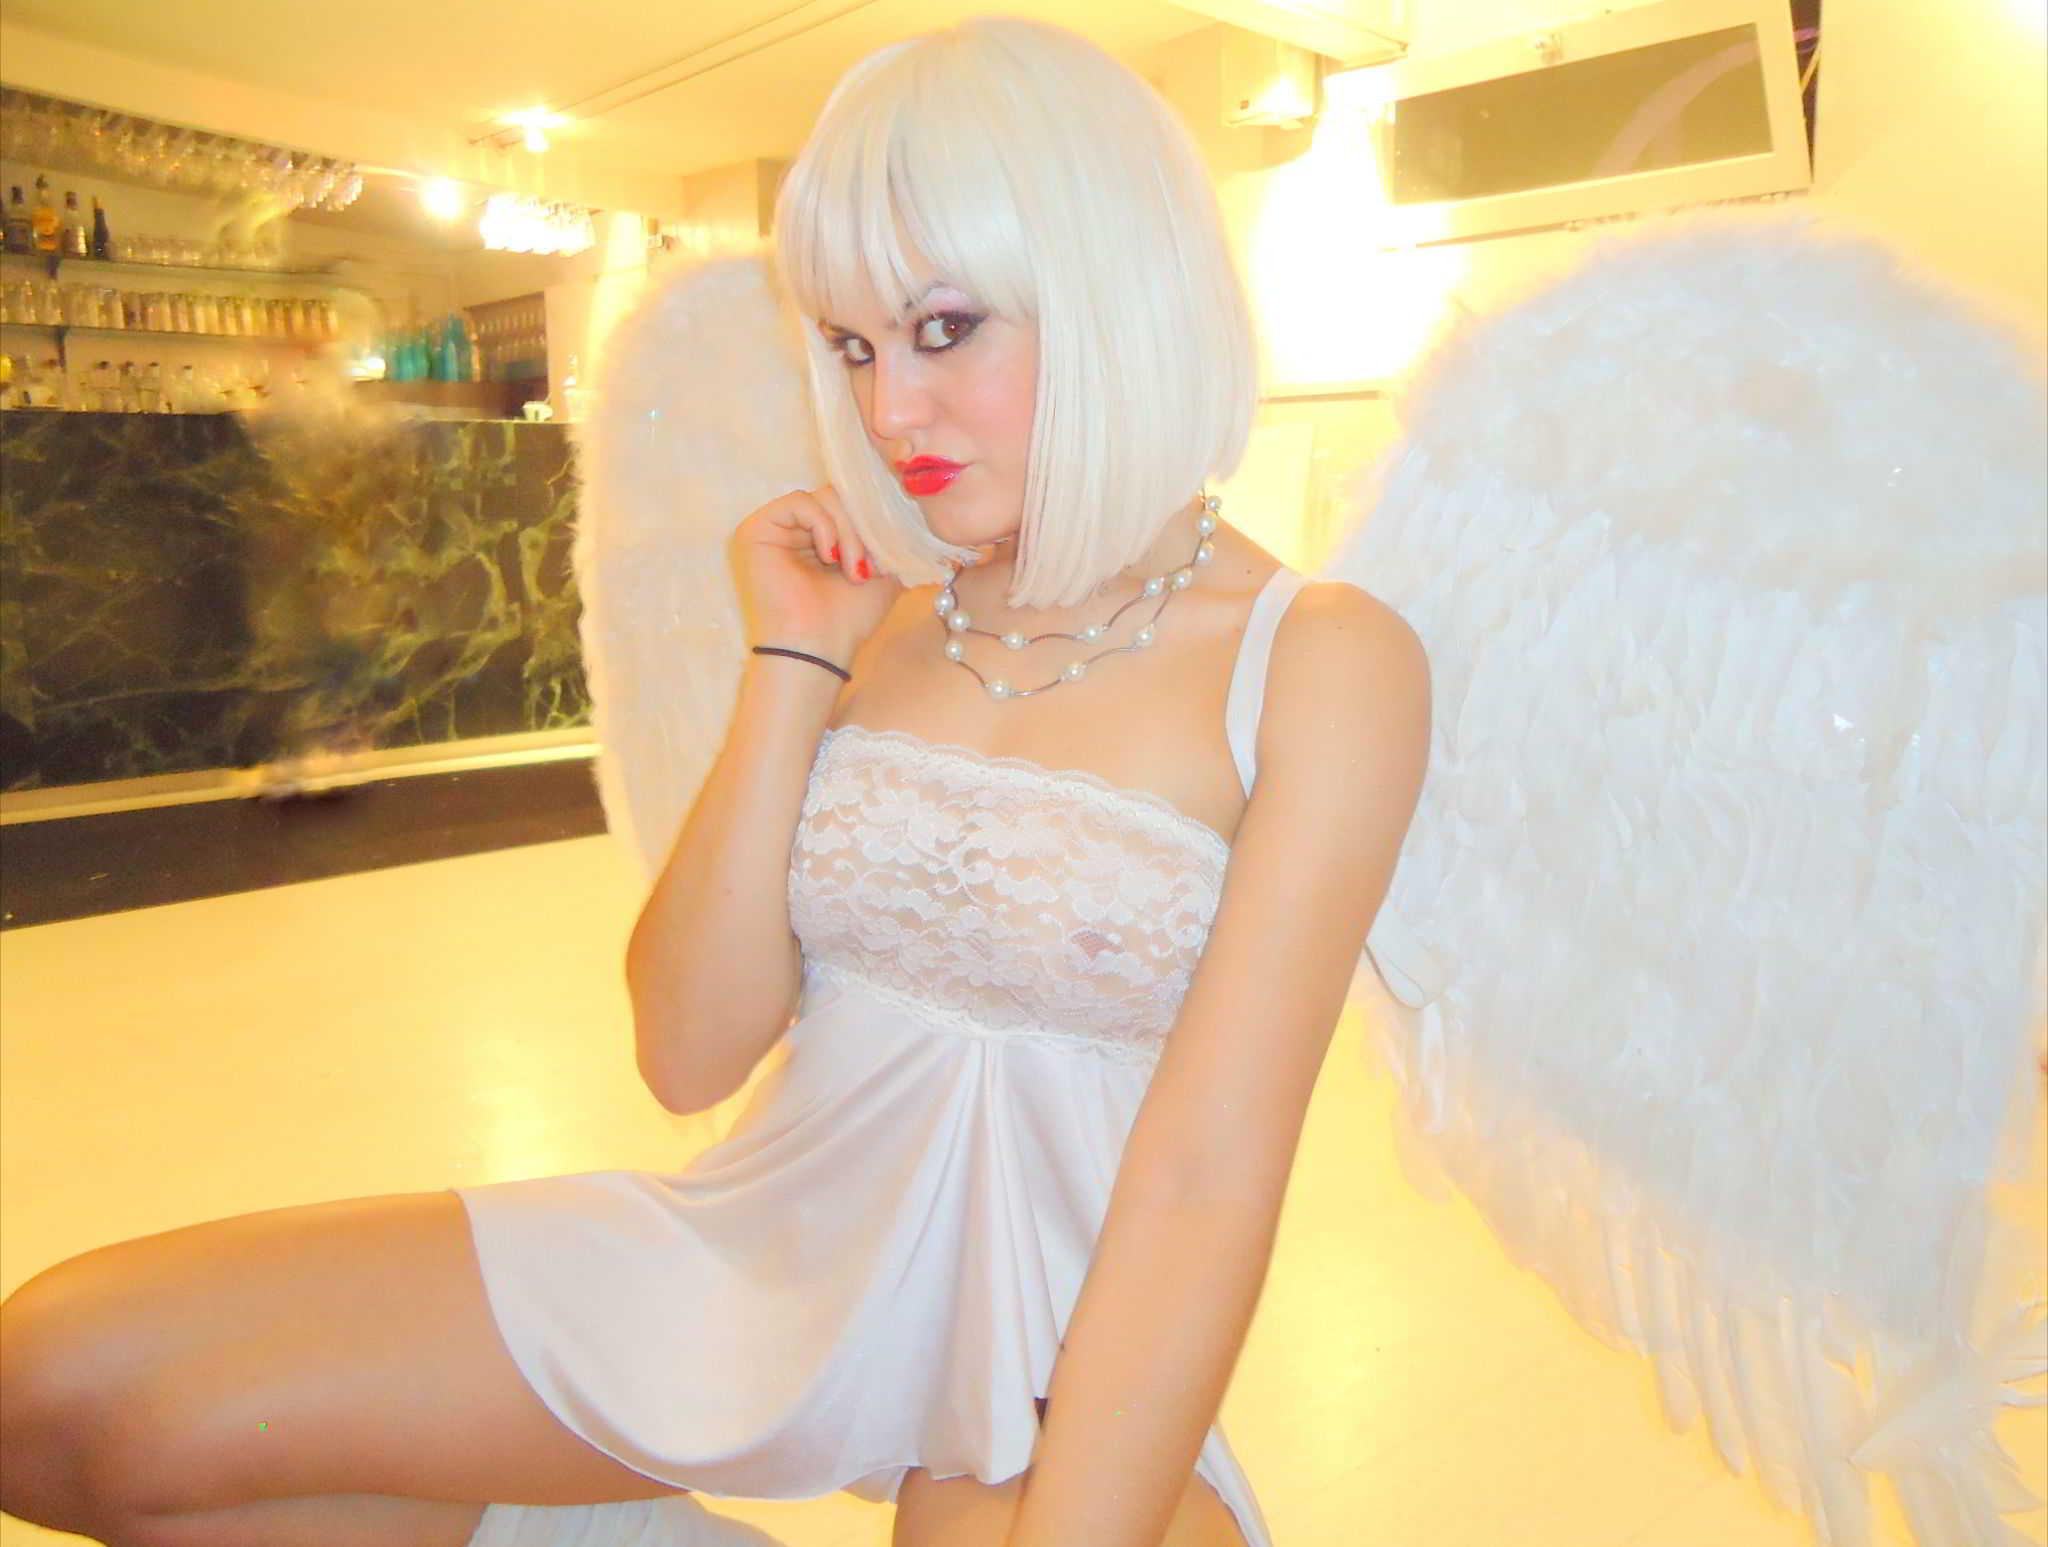 Stripteaseuse Foix Lilou